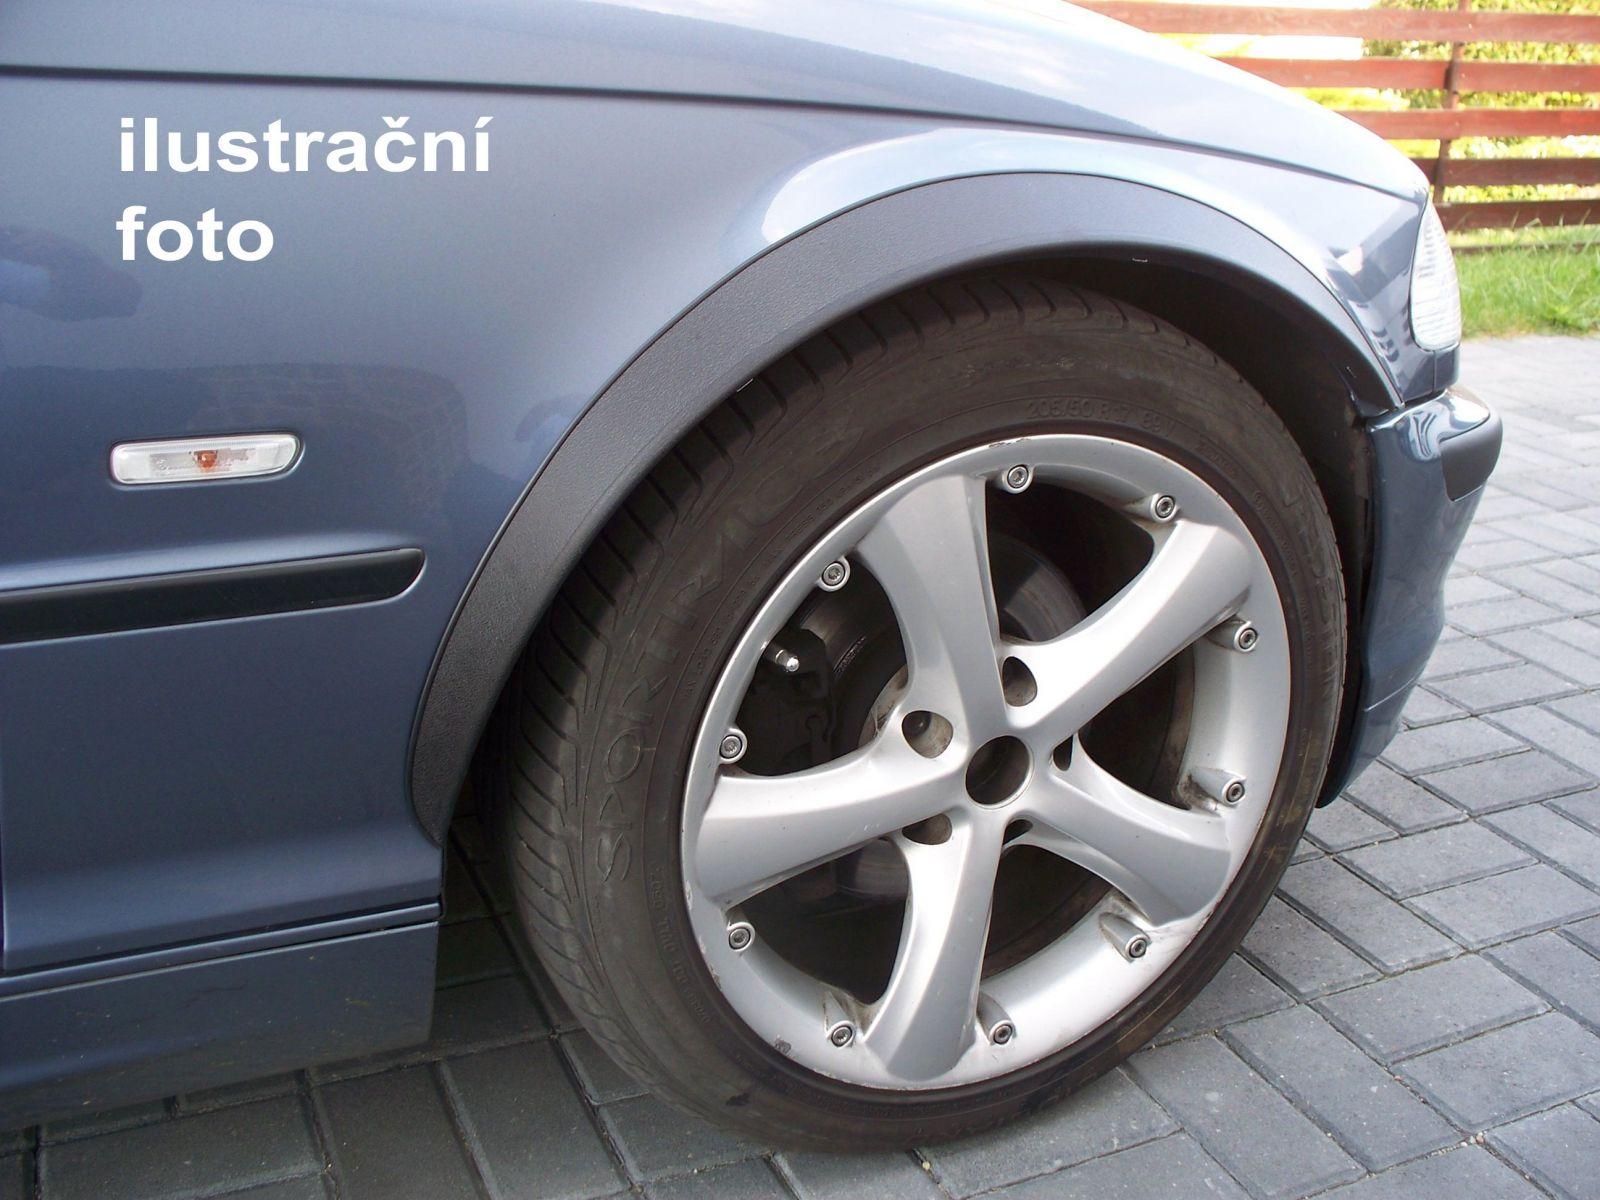 Globmel Lemy blatníků Volkswagen Passat B6, 4-dvéř. sedan, kombi, černý mat